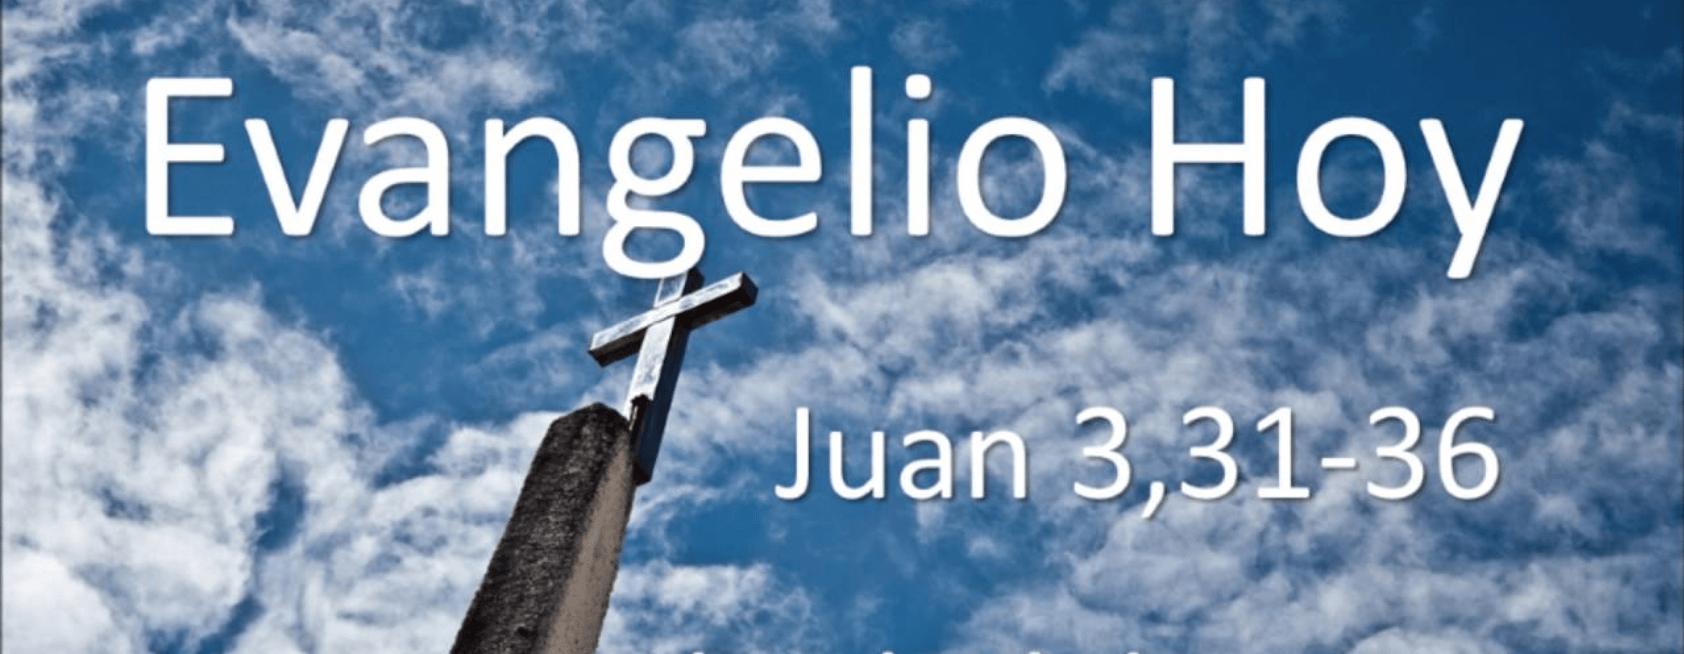 Evangelio según San Juan 3,31-36.